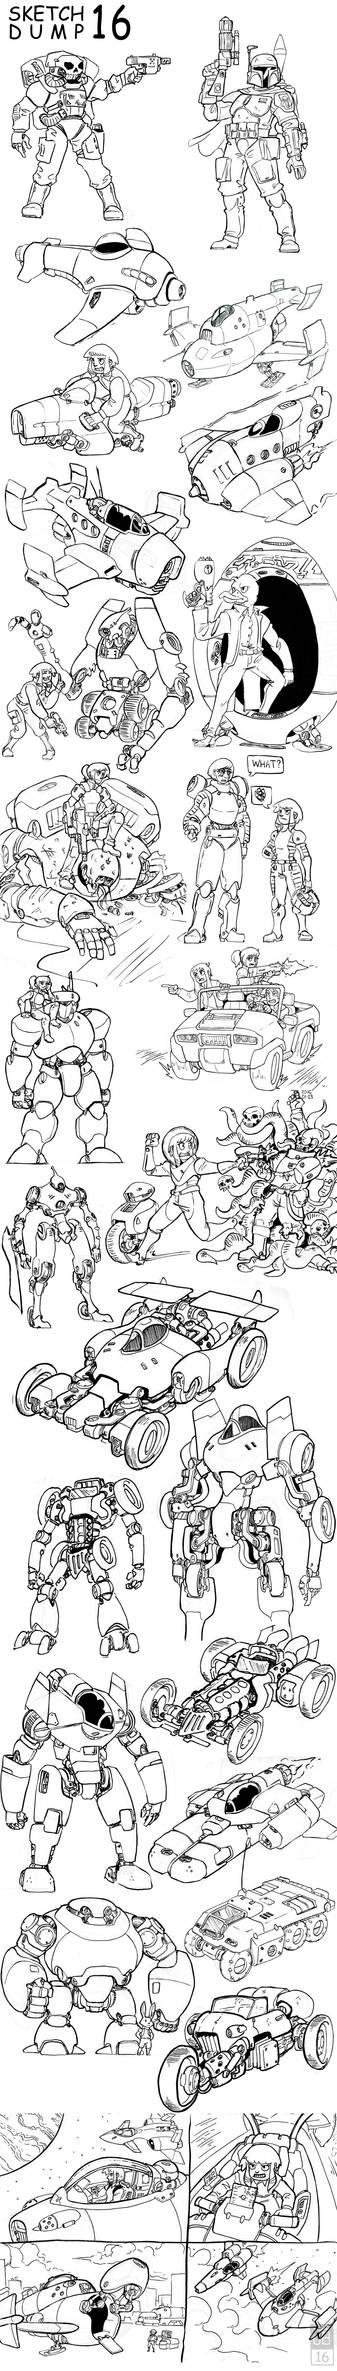 SketchDump 16